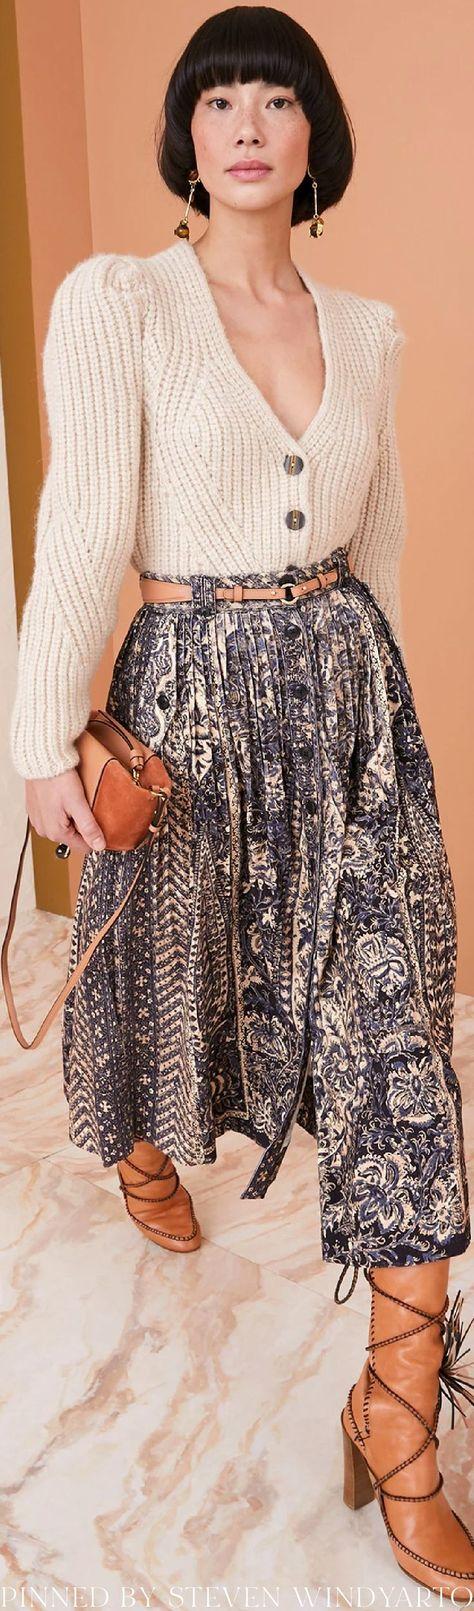 Ulla Johnson Fall 2021 Lookbook - Greta Cardigan #fall2021 #fw21 #womenswear #ullajohnson